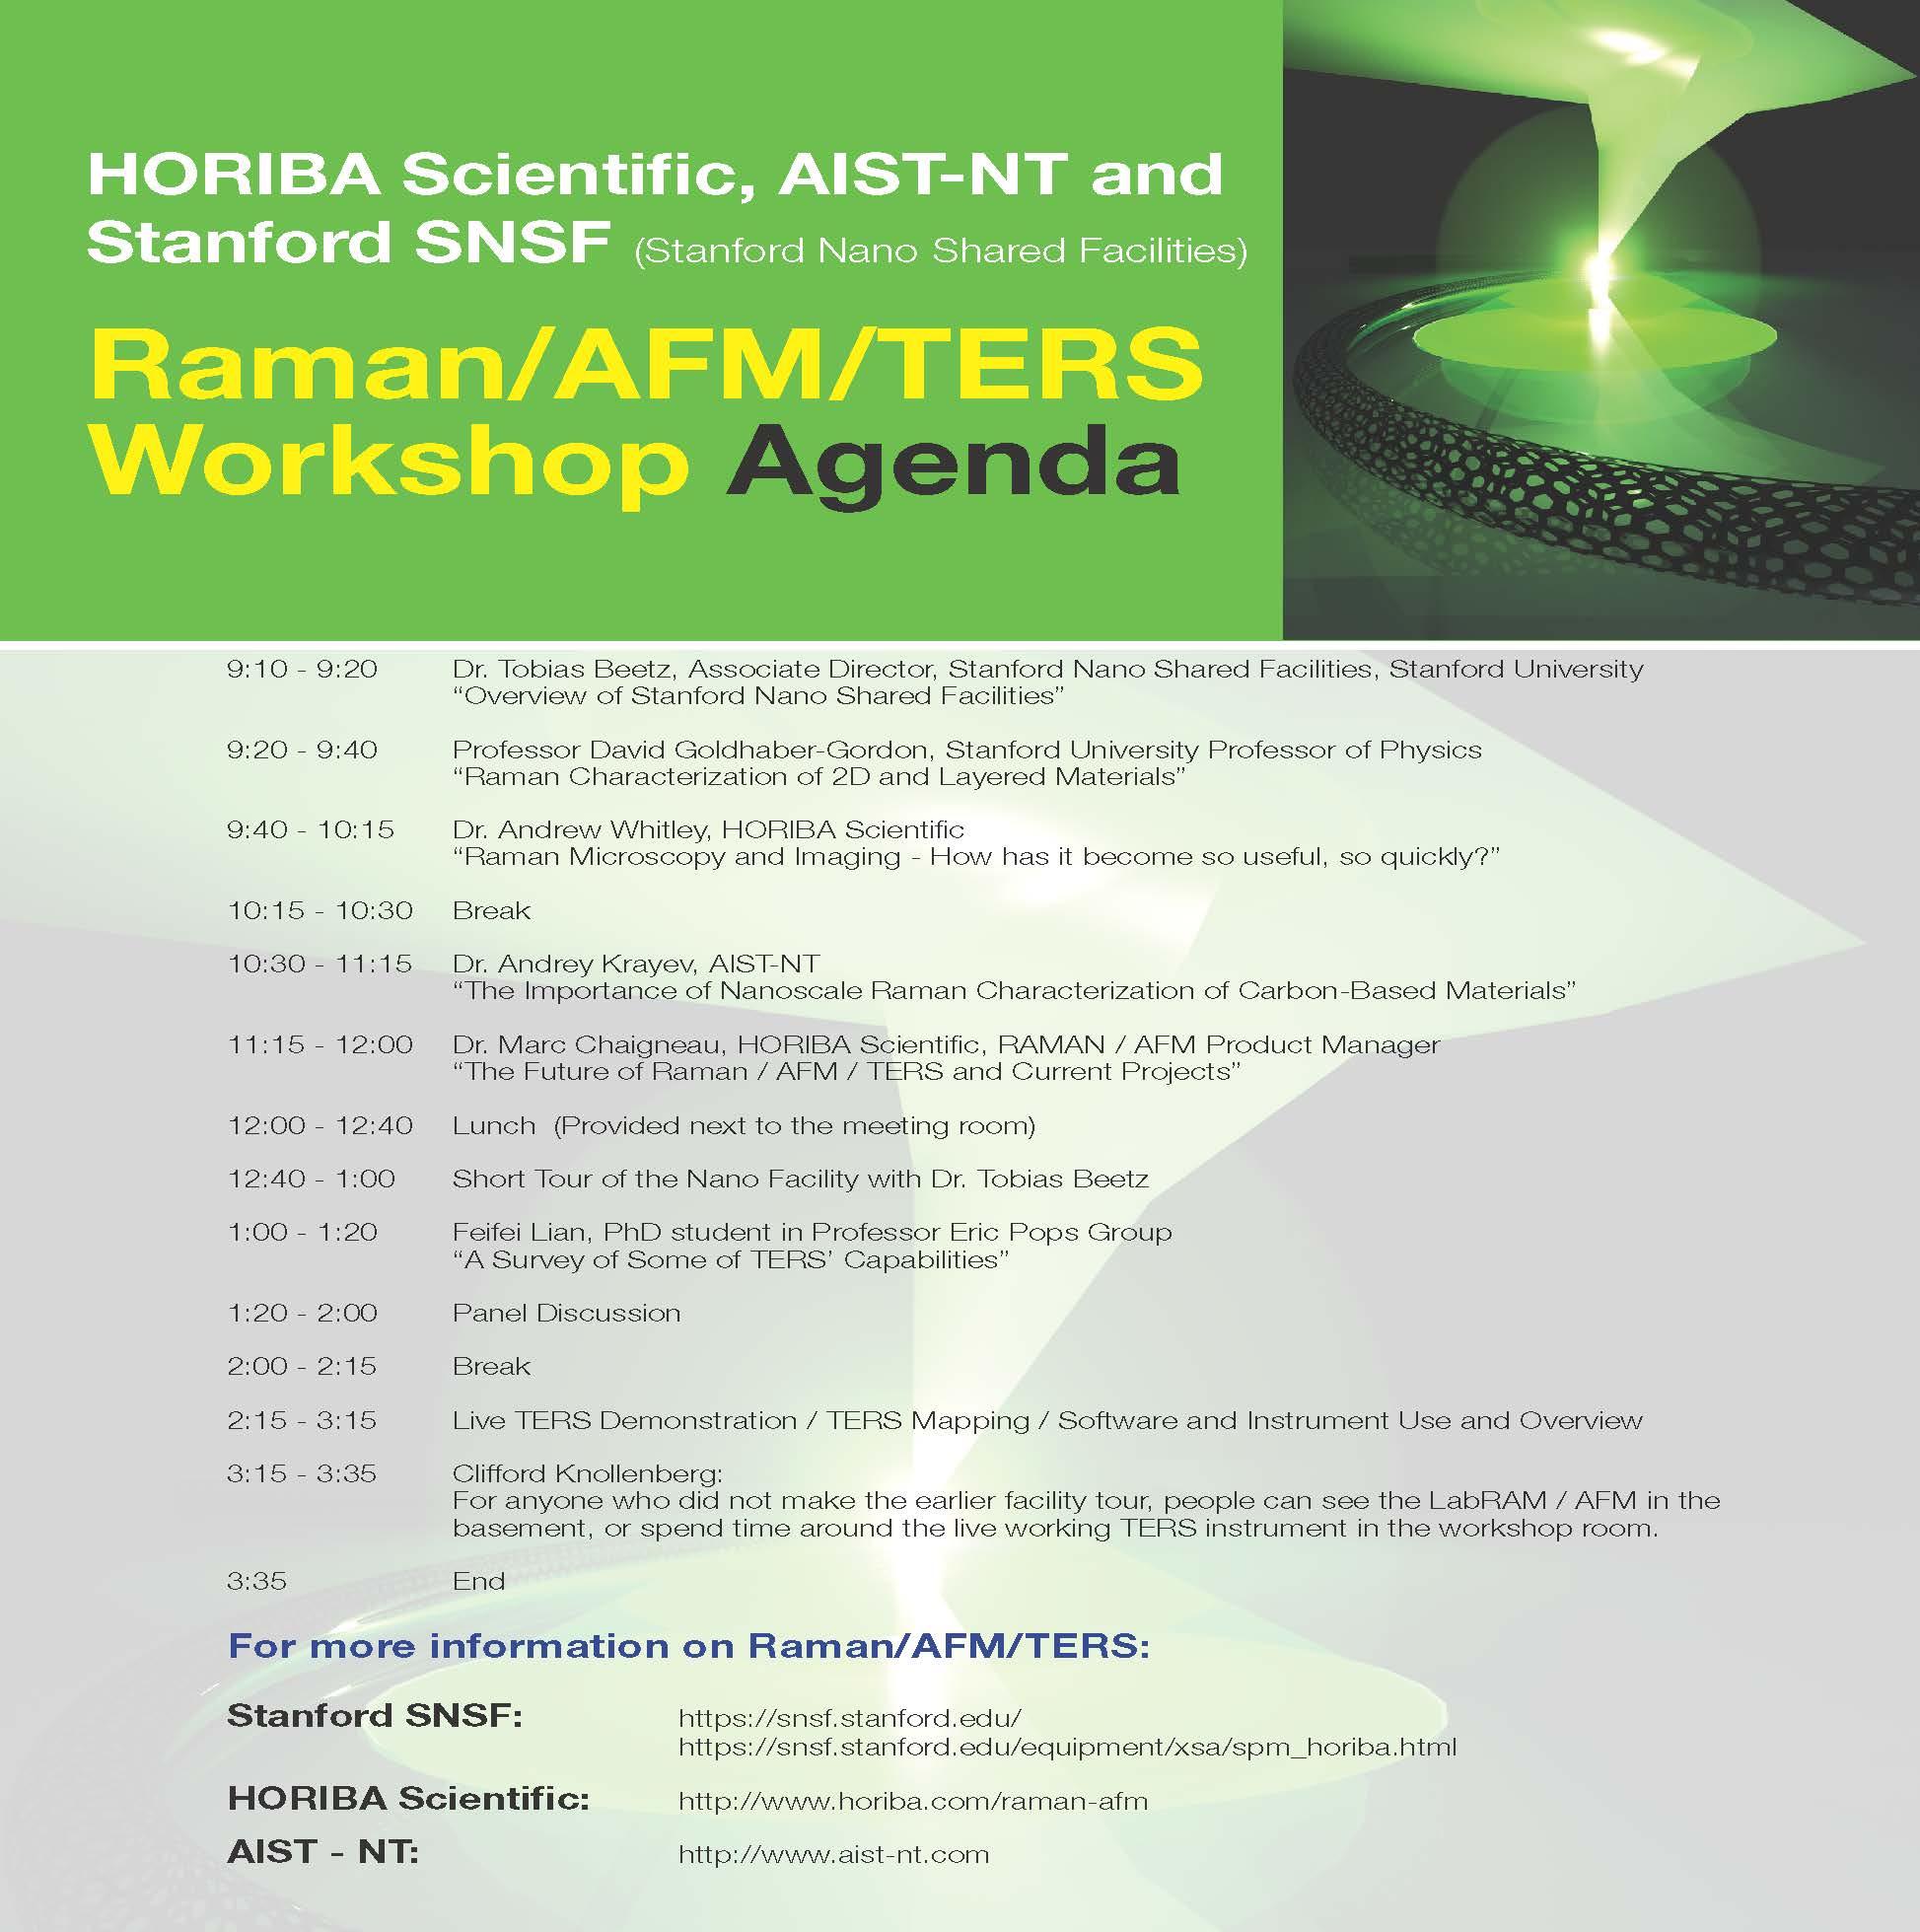 Agenda for the Raman/AFM/TERS Workshop